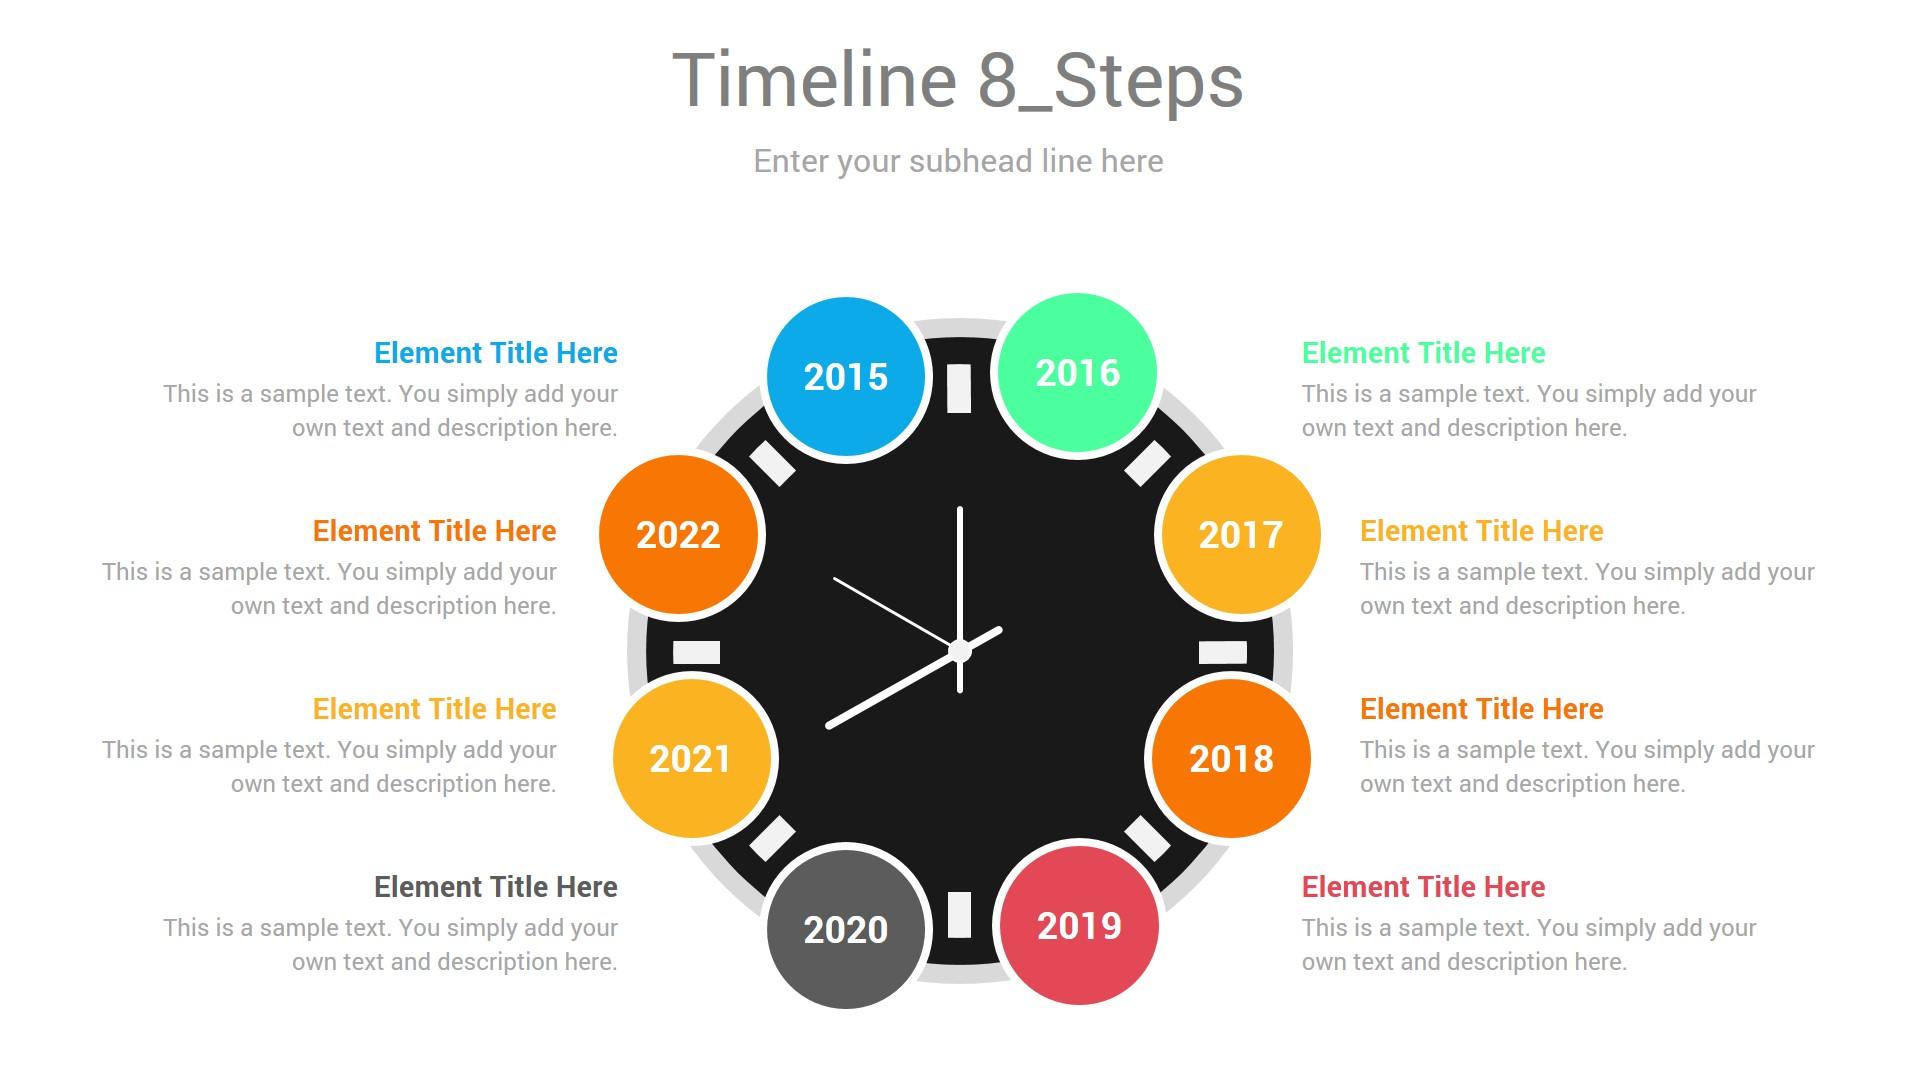 Timeline Analysis Infographic